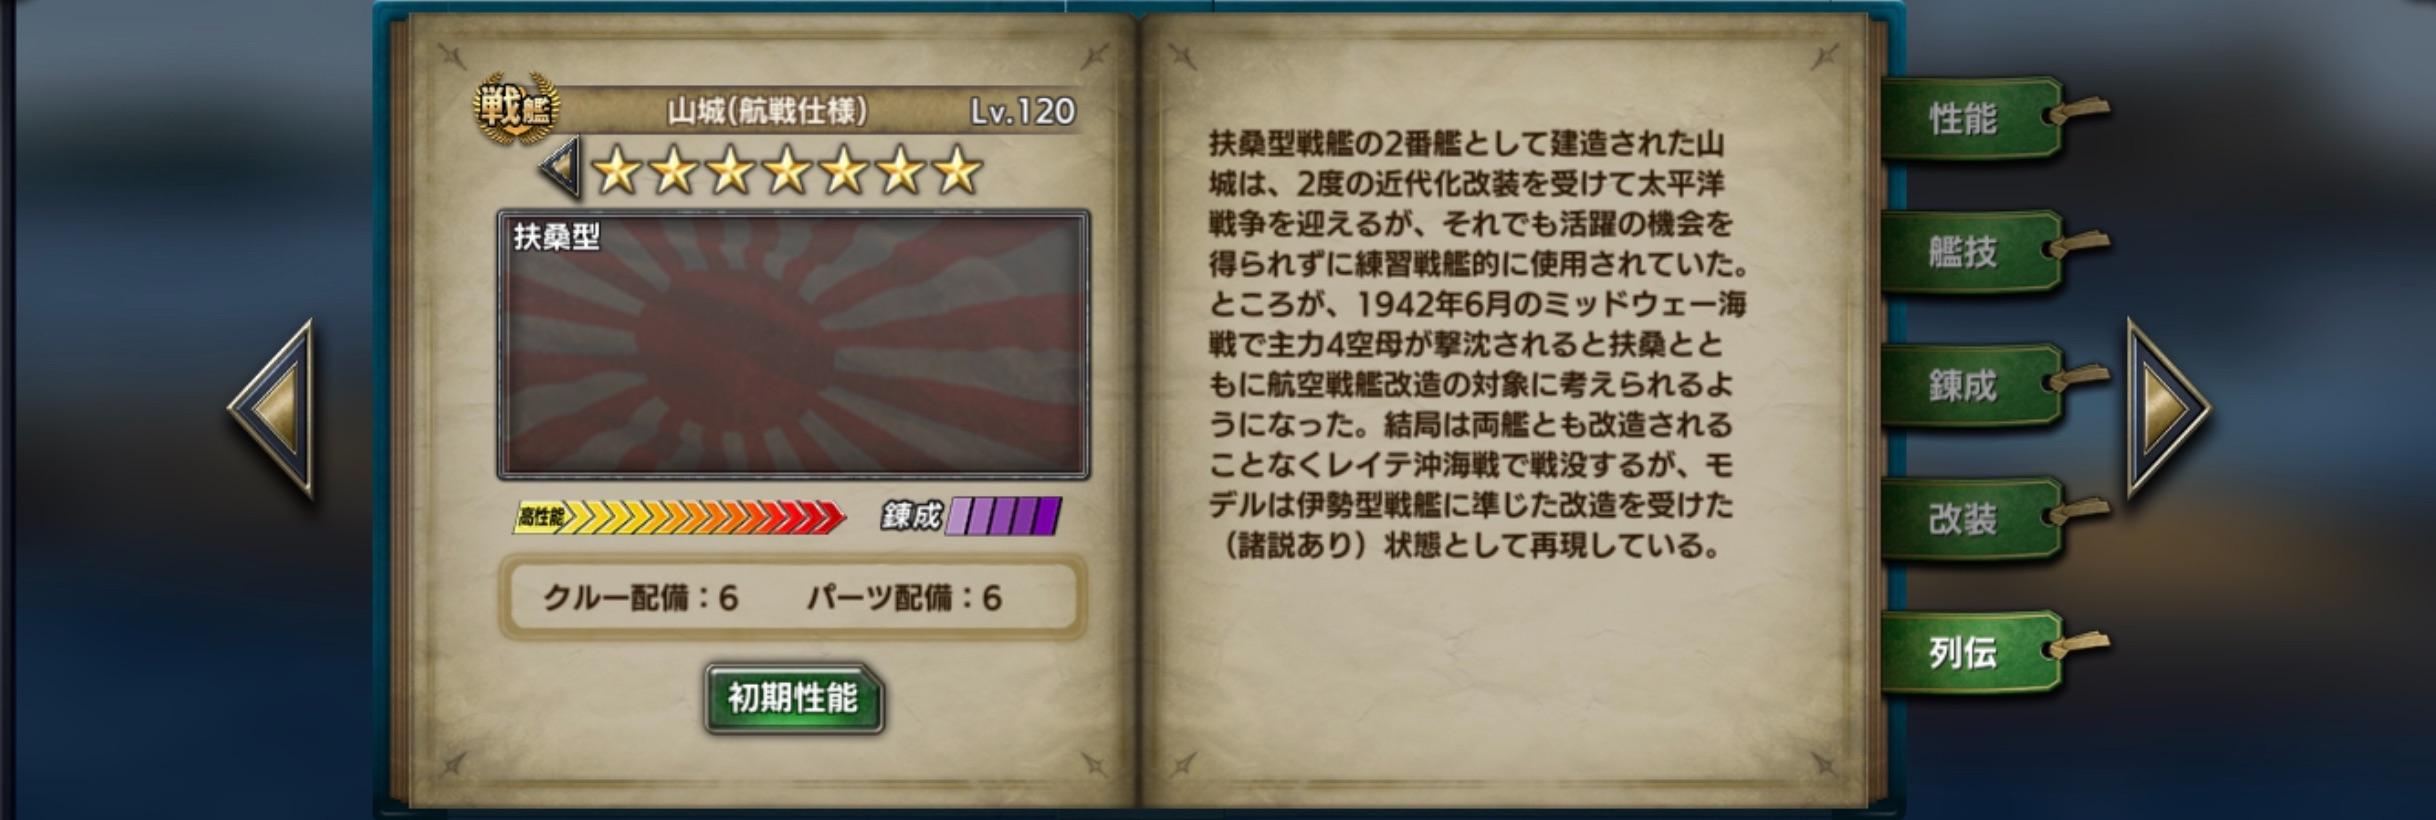 YamashiroBs-history